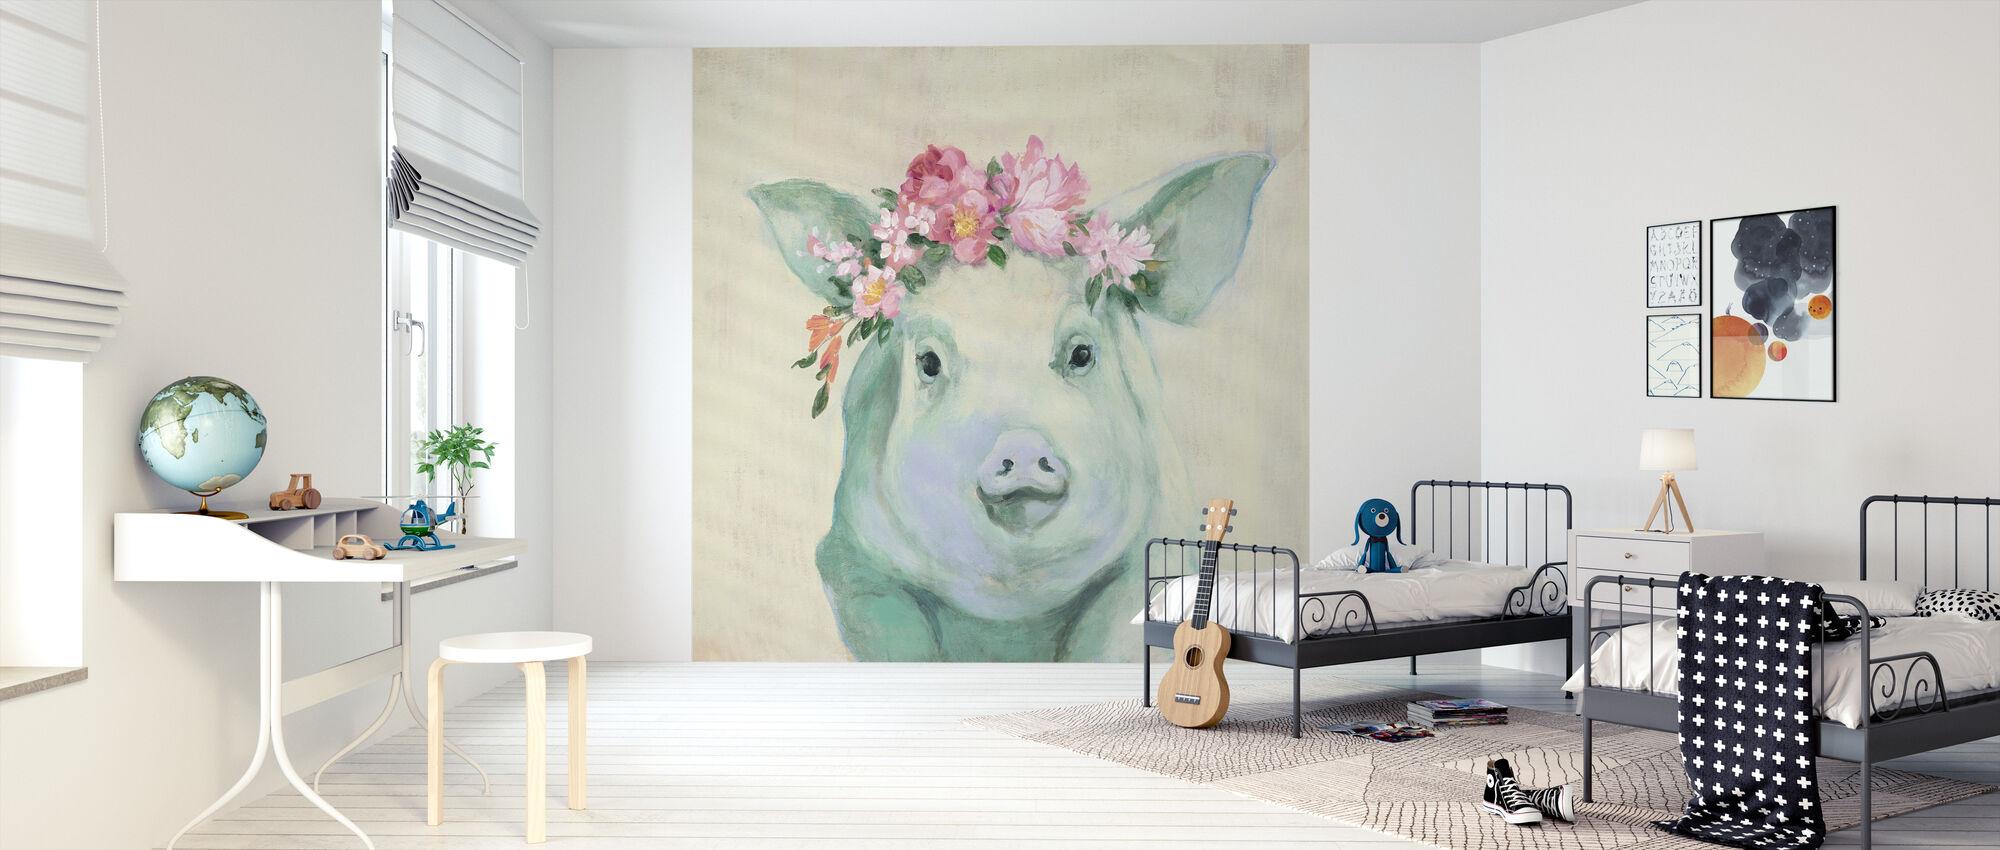 Festival Girl IIII - Wallpaper - Kids Room